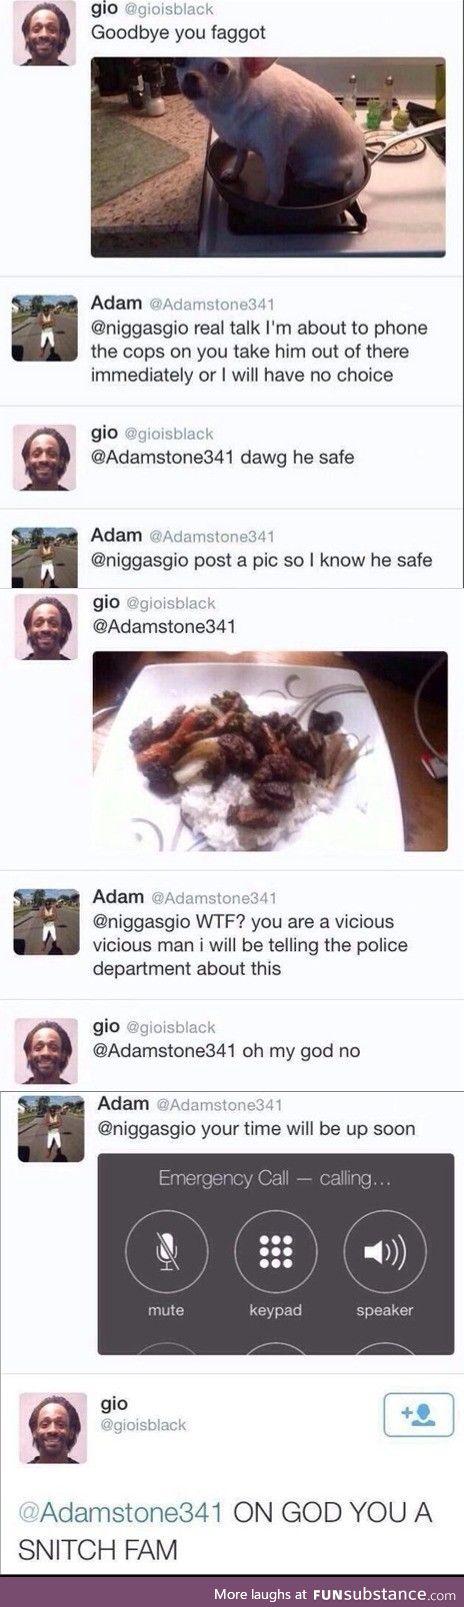 A classic black tweet